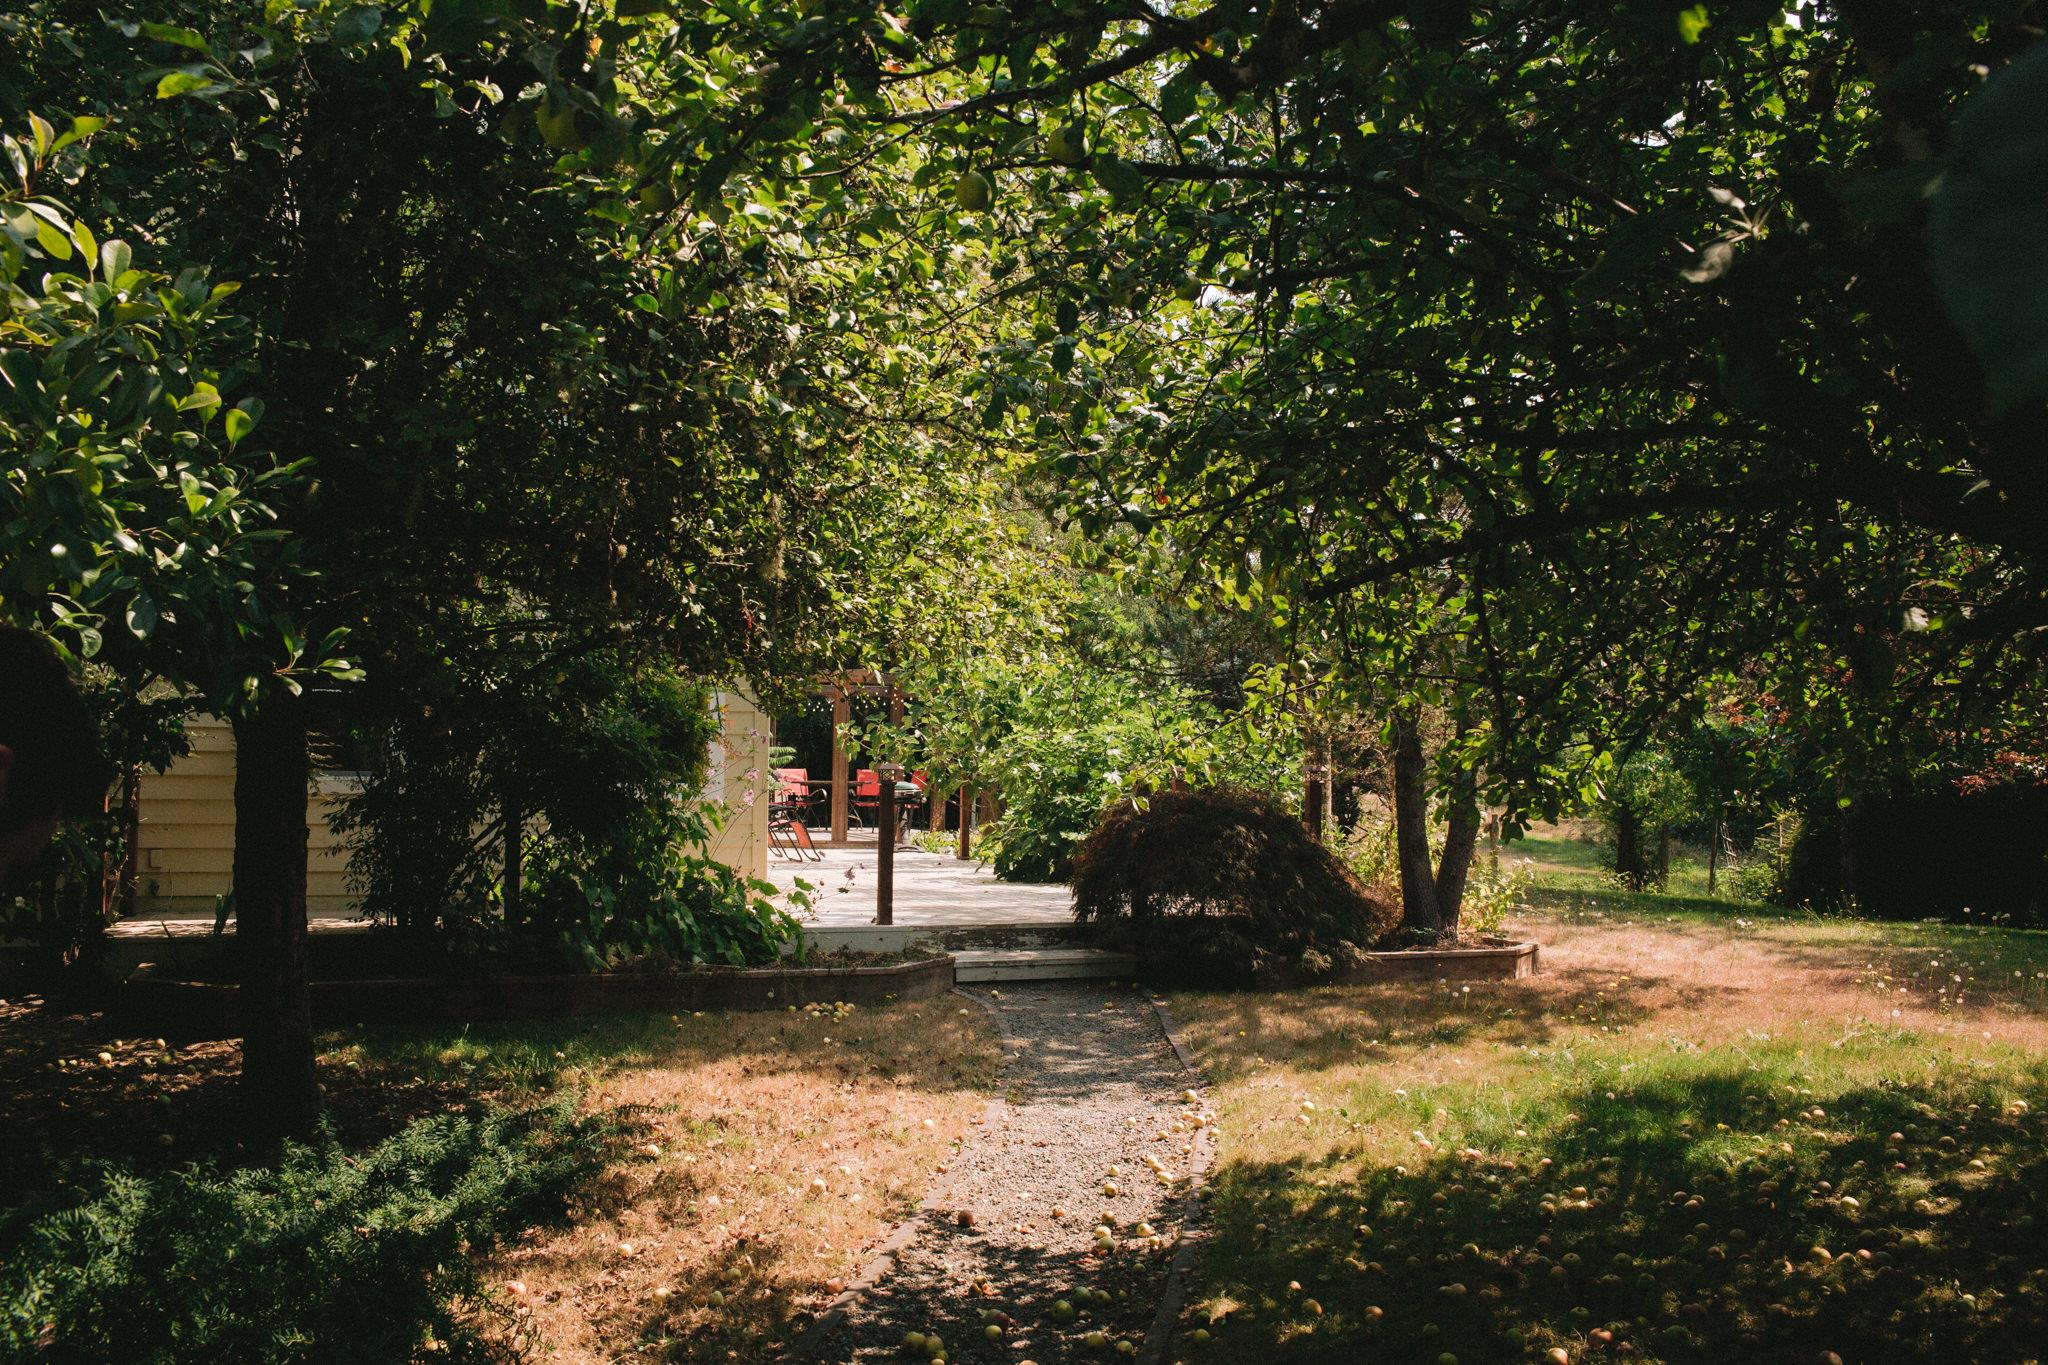 Backyard-Bainbridge-Island-Wedding-Alycia-Lovell-Photography-3.JPG